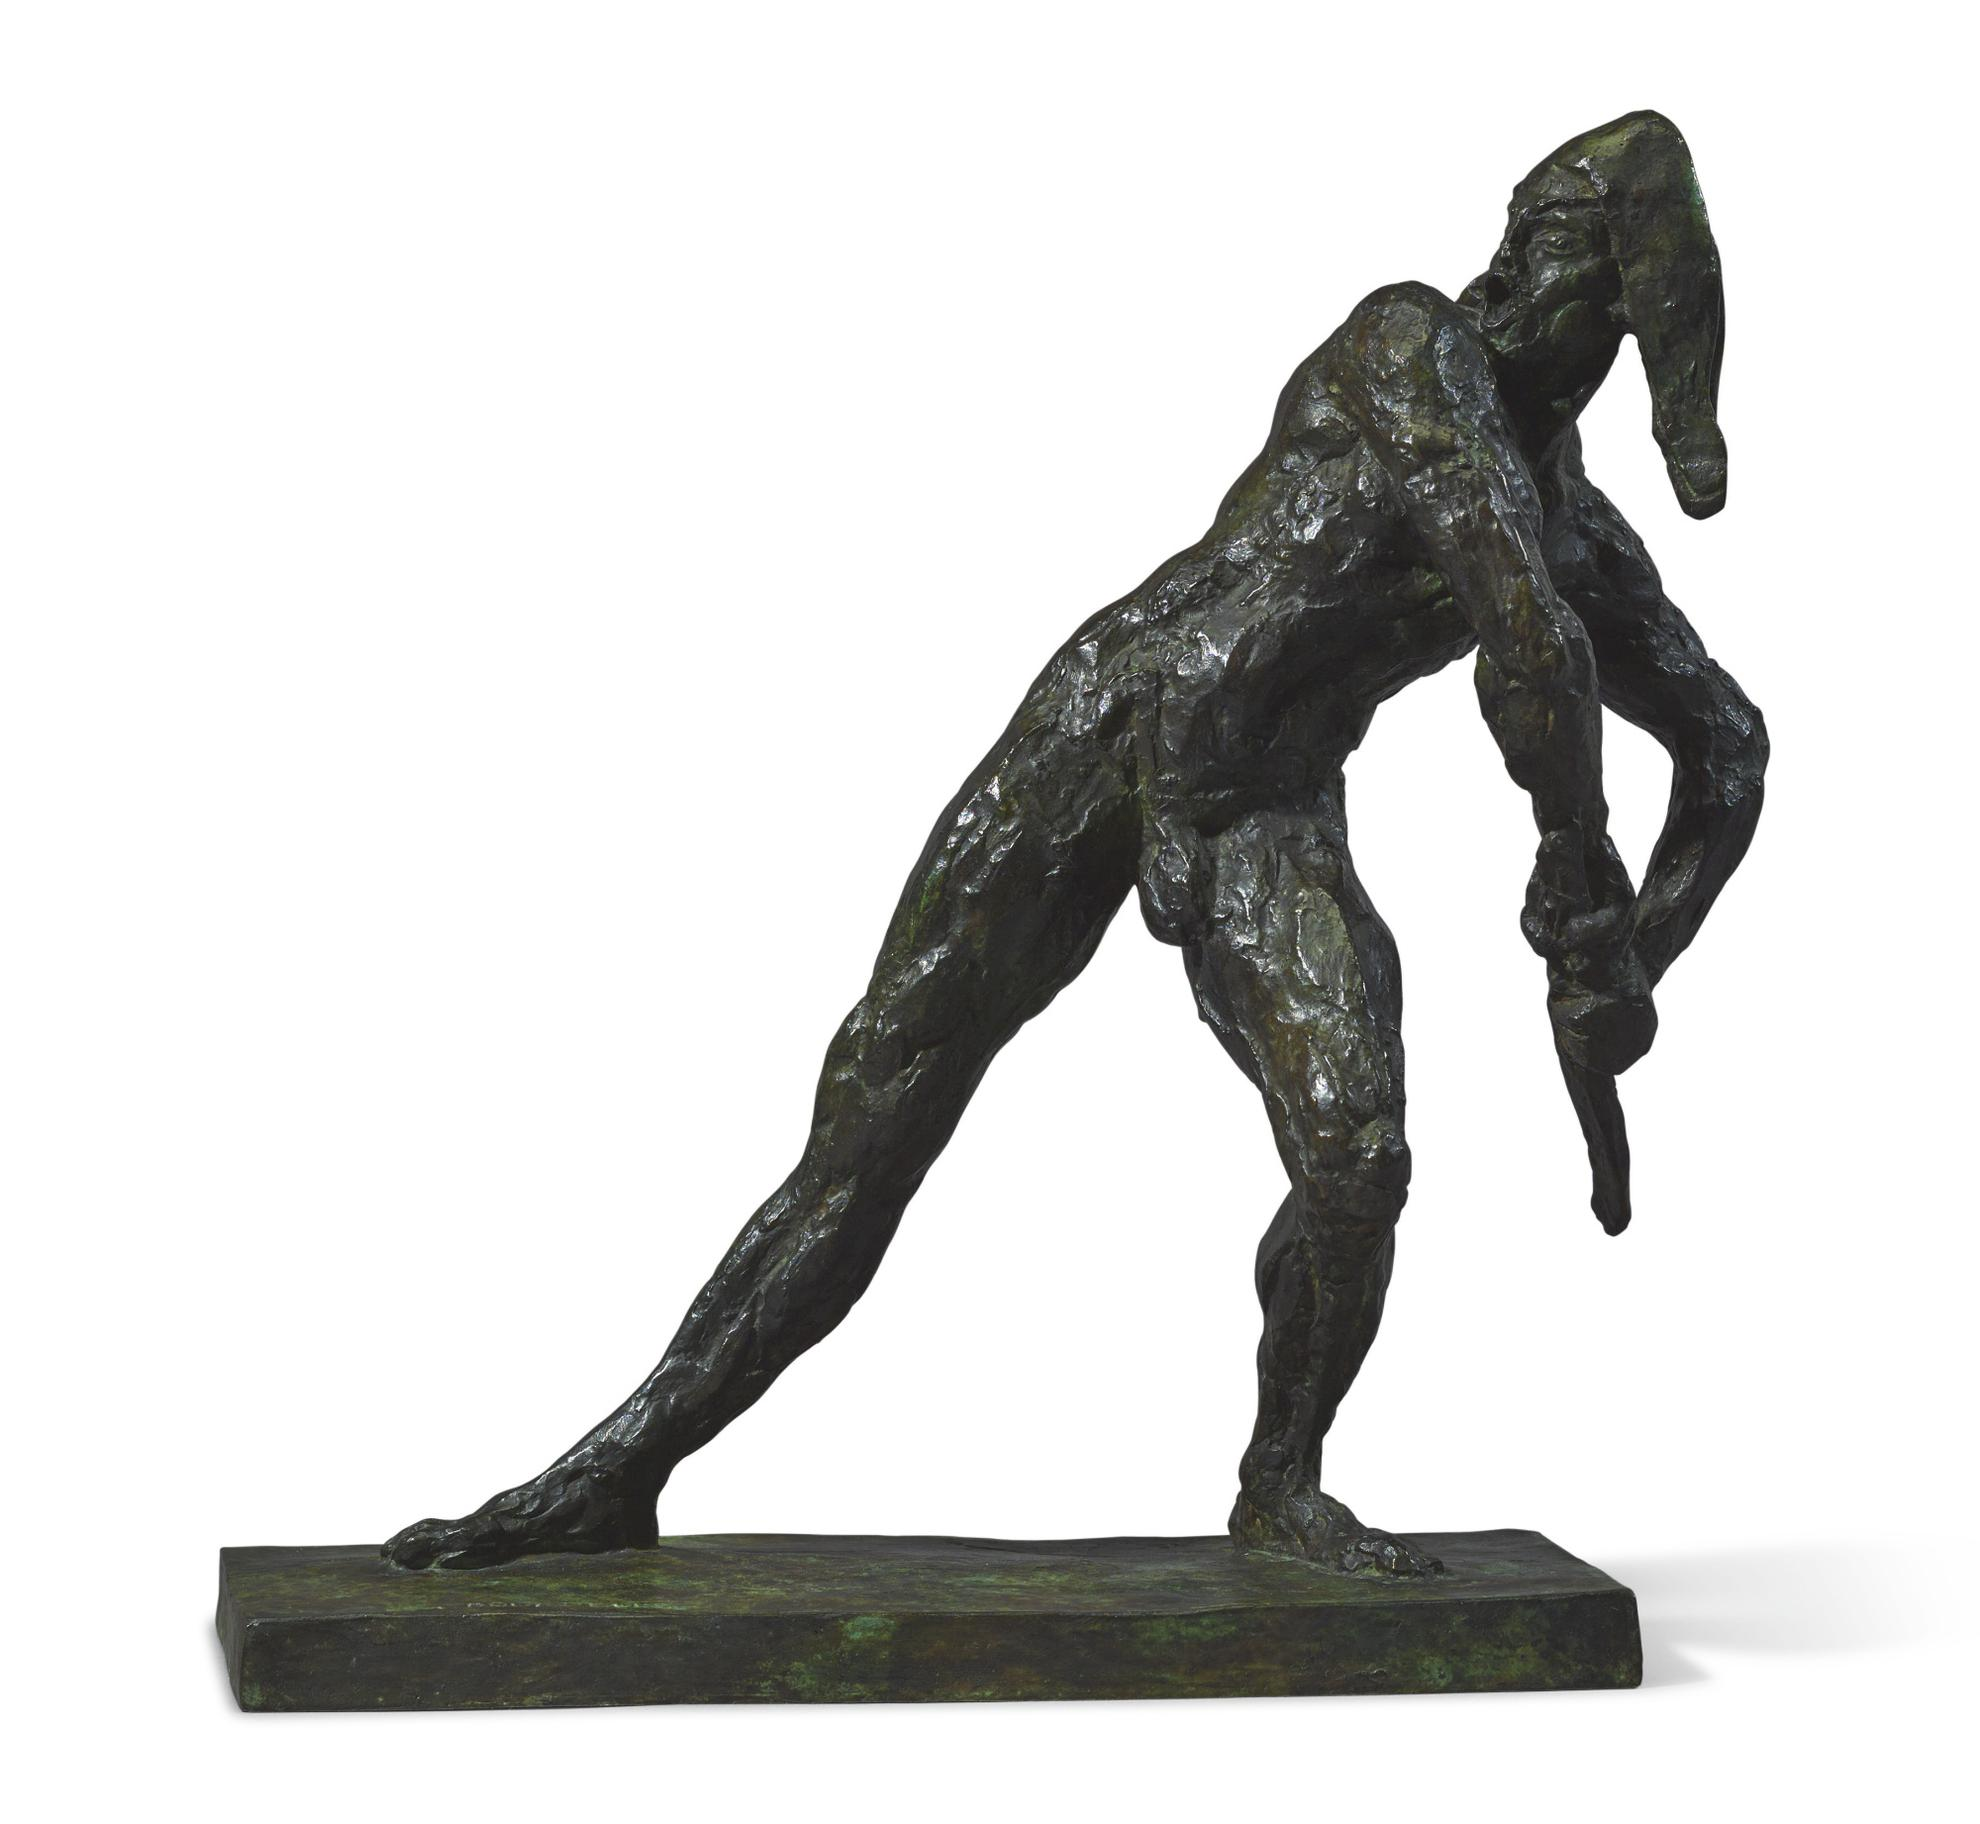 Emile Antoine Bourdelle - Larlequin-1905